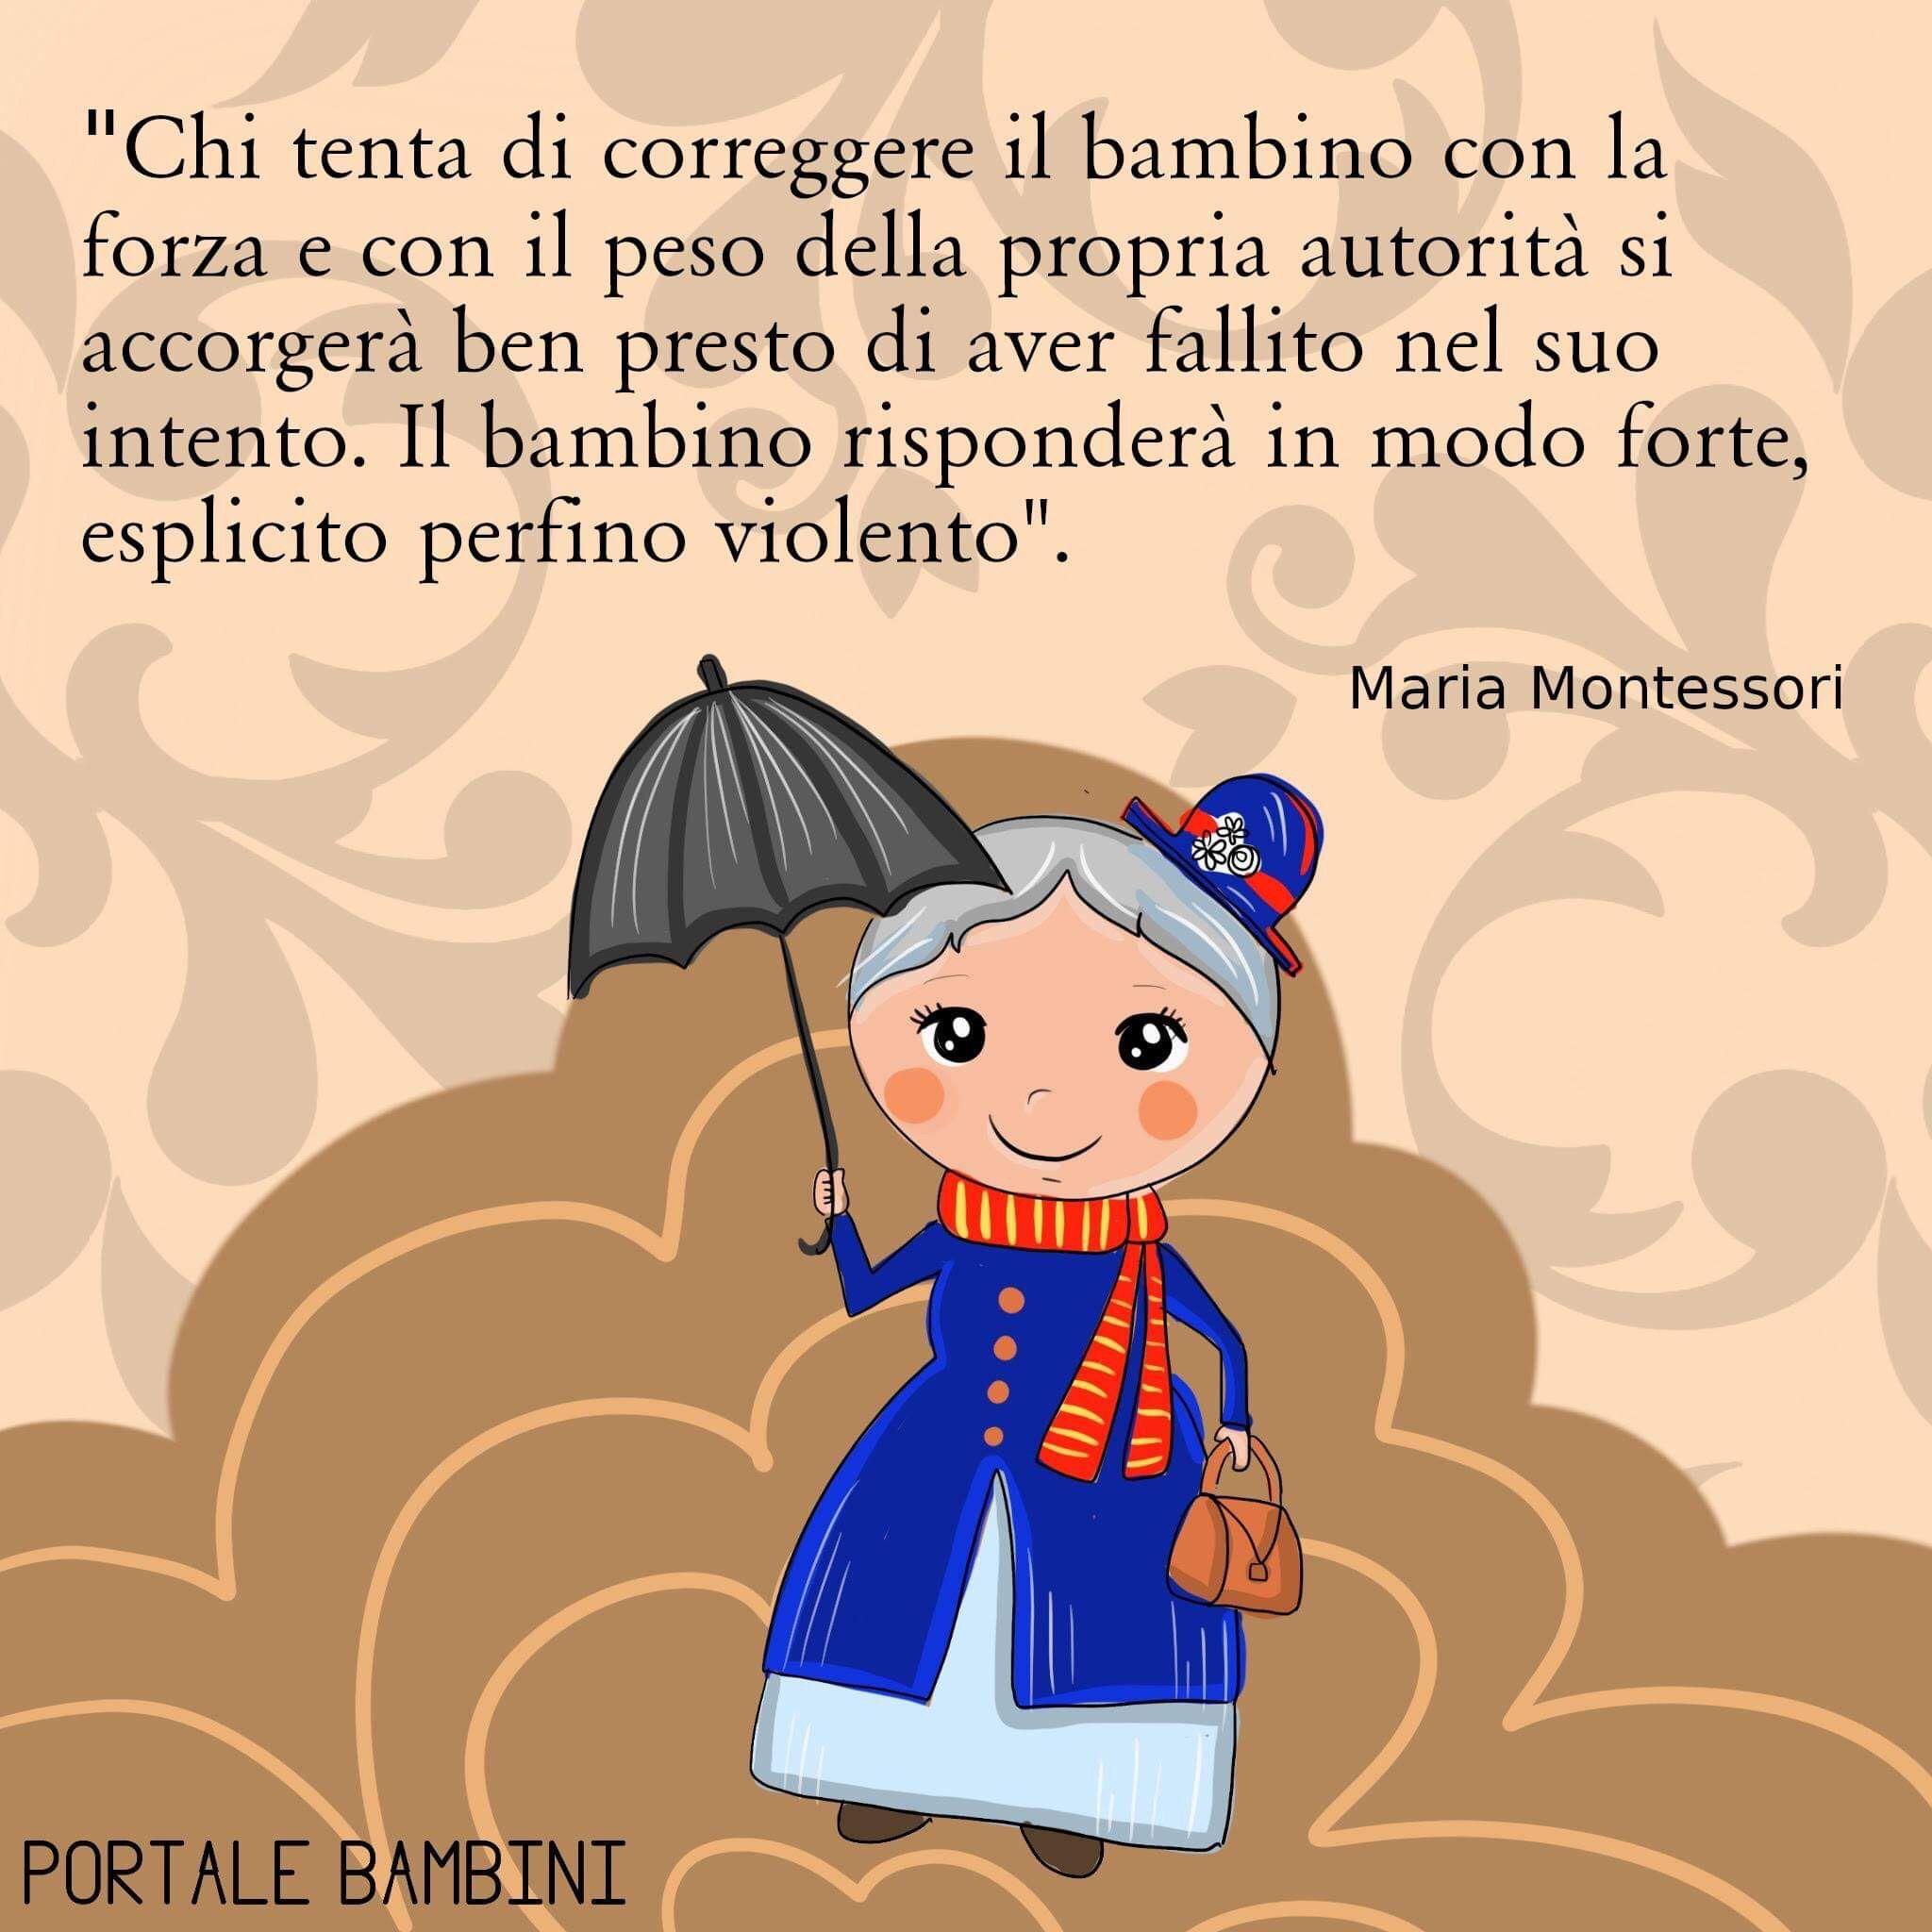 Le Frasi Piu Belle E Significative Di Maria Montessori Citazioni